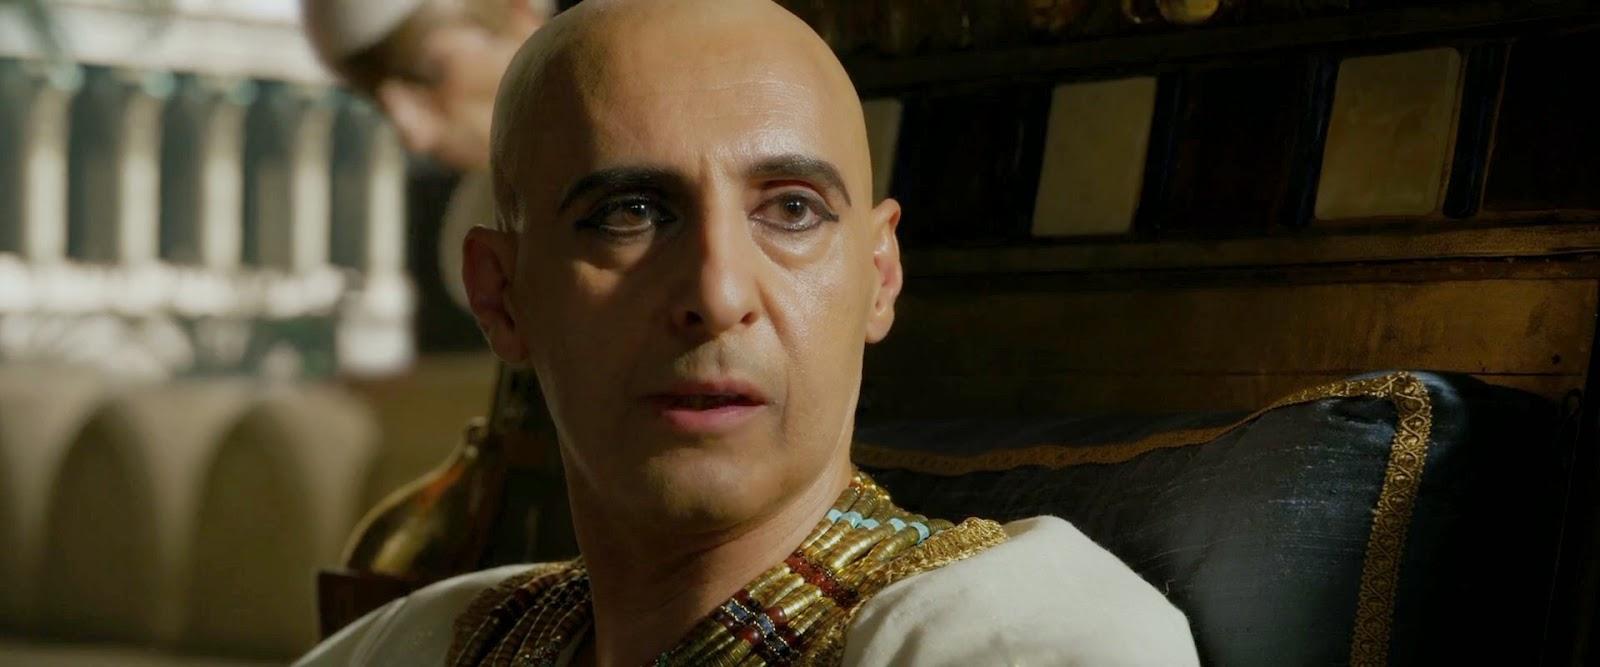 Exodus: Gods and Kings (2014) S4 s Exodus: Gods and Kings (2014)